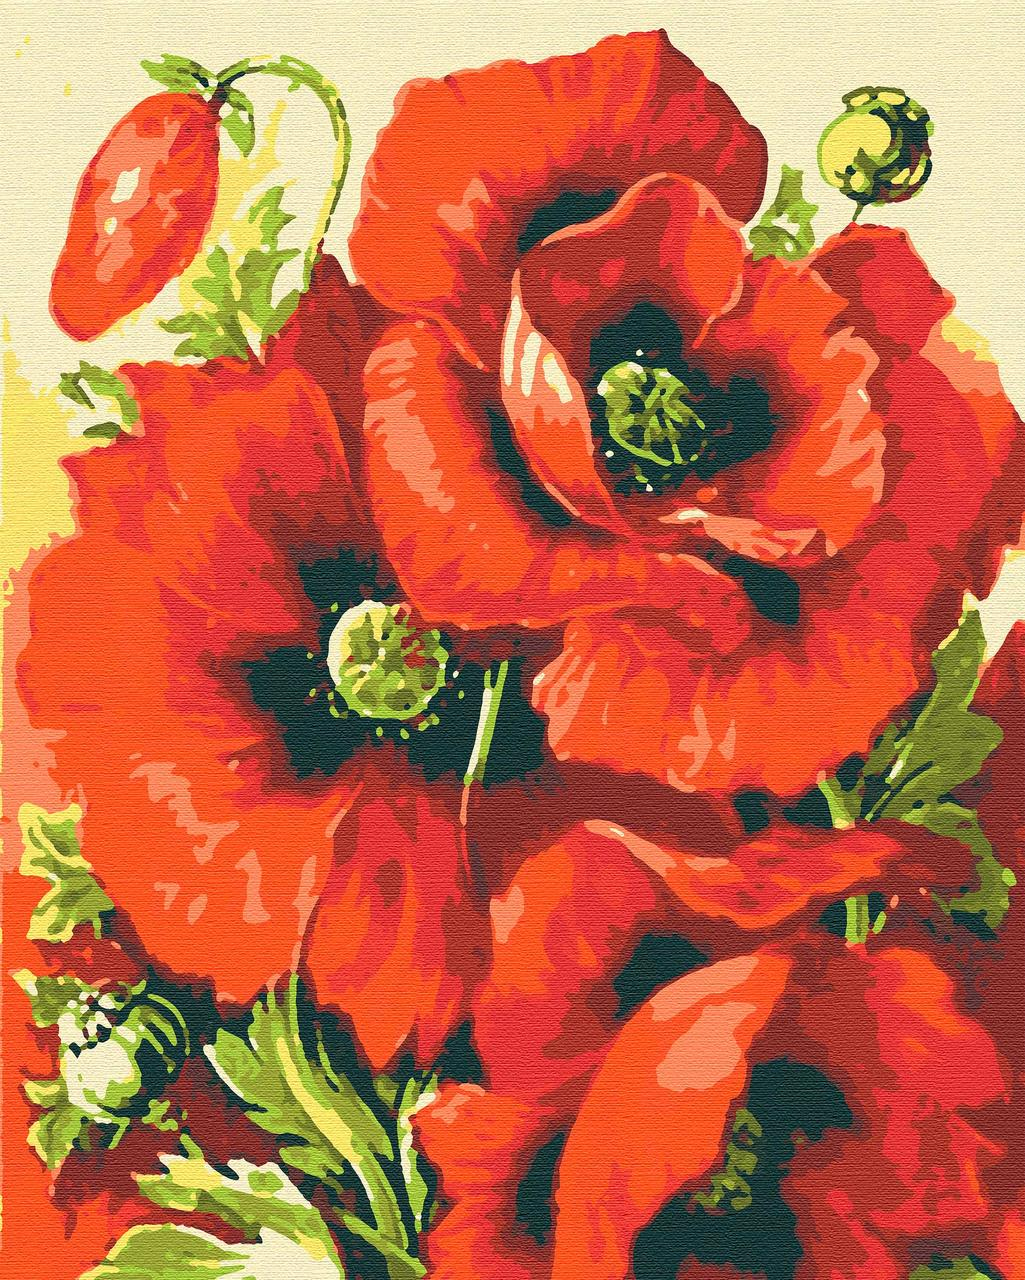 Картини за номерами квіти маки 40х50 Маки